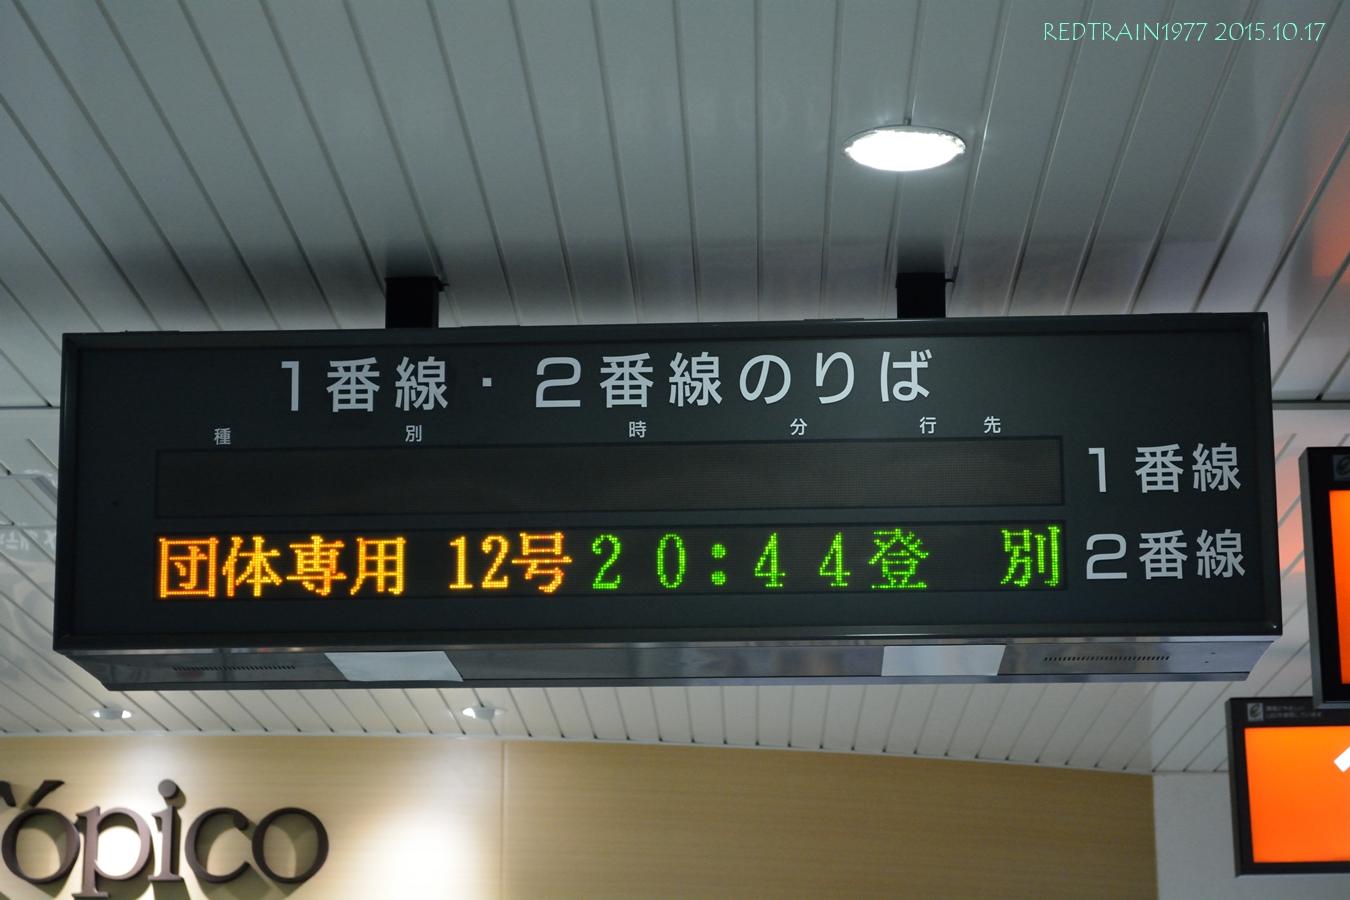 aDSC_3886.jpg